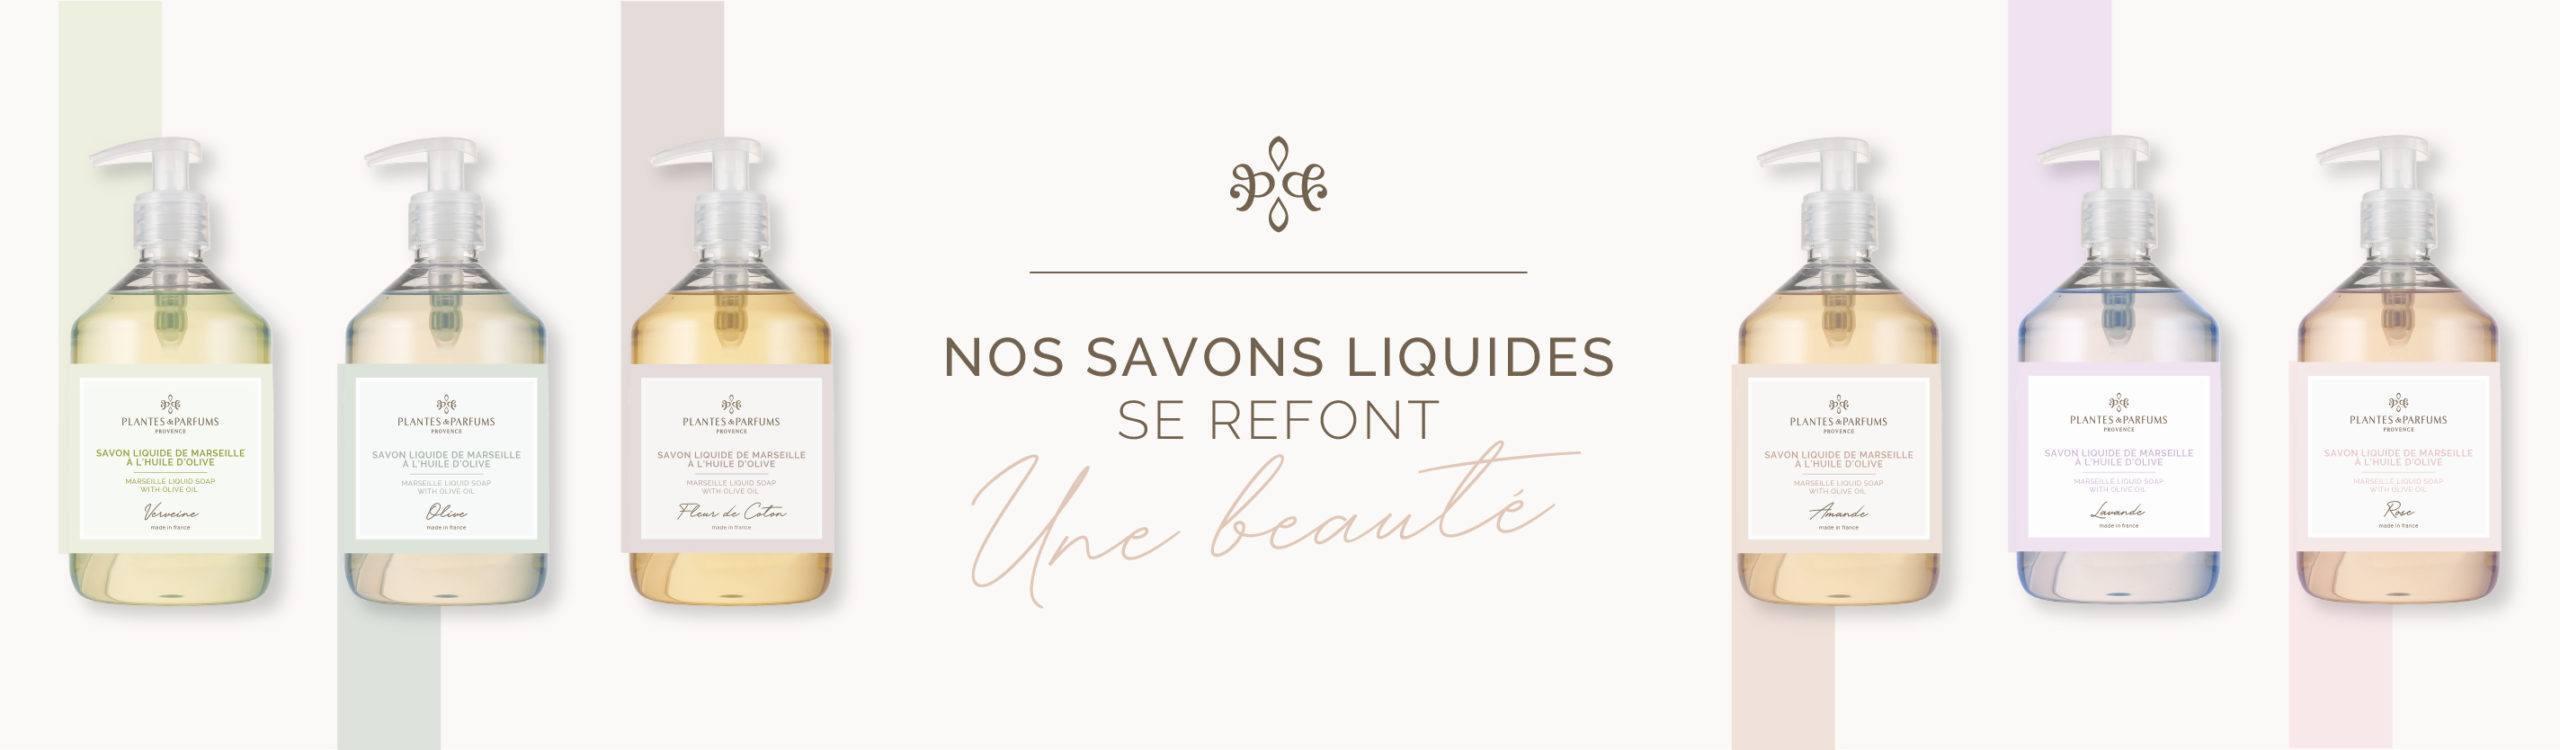 Banniere_Savons_Liquides_1020